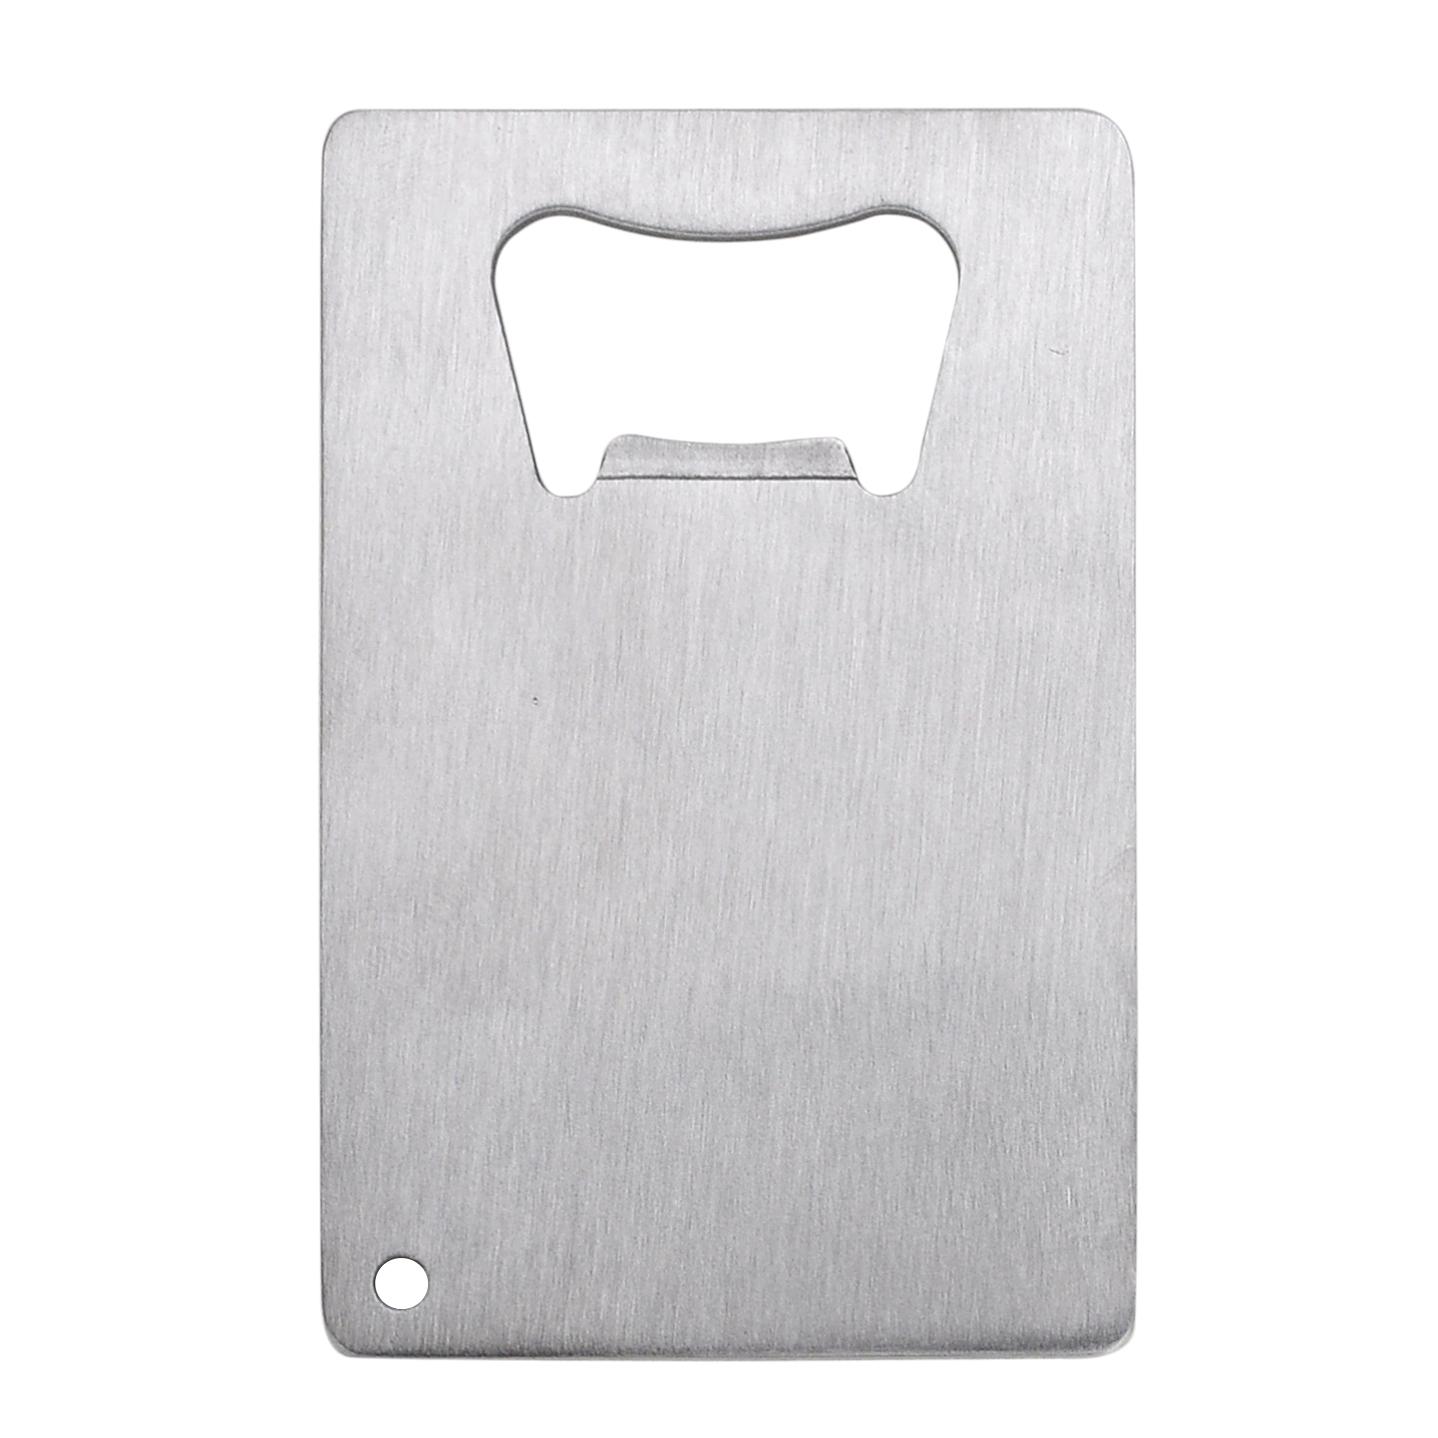 Engraved Stainless Steel Wedding Date Wallet Card Bottle Opener